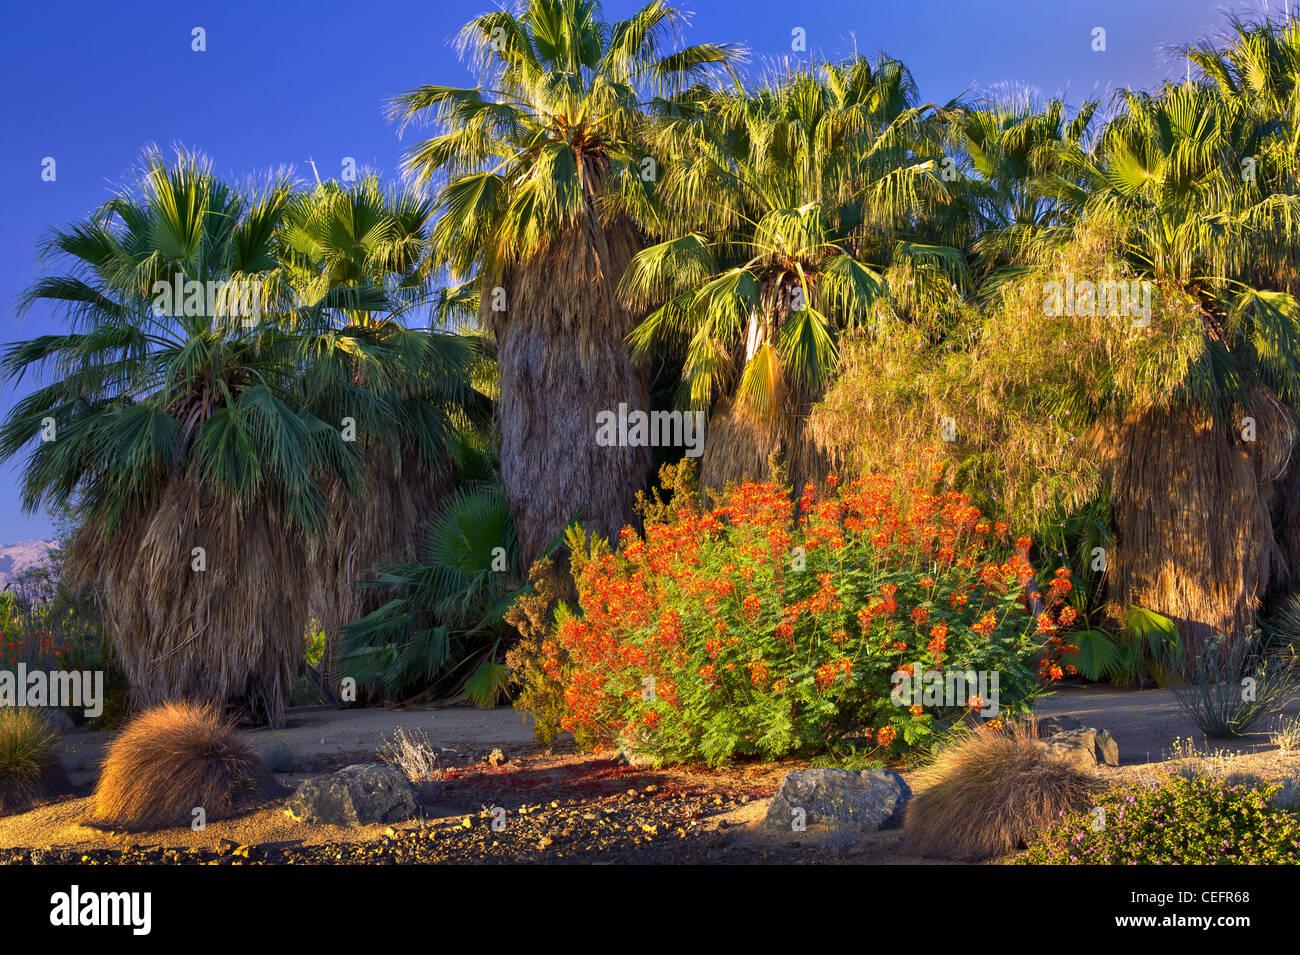 Palm trees and Dwarf Poinciana, Red Bird of Paradise bush. Desert Willow Golf Resort, Palm Desert, California - Stock Image